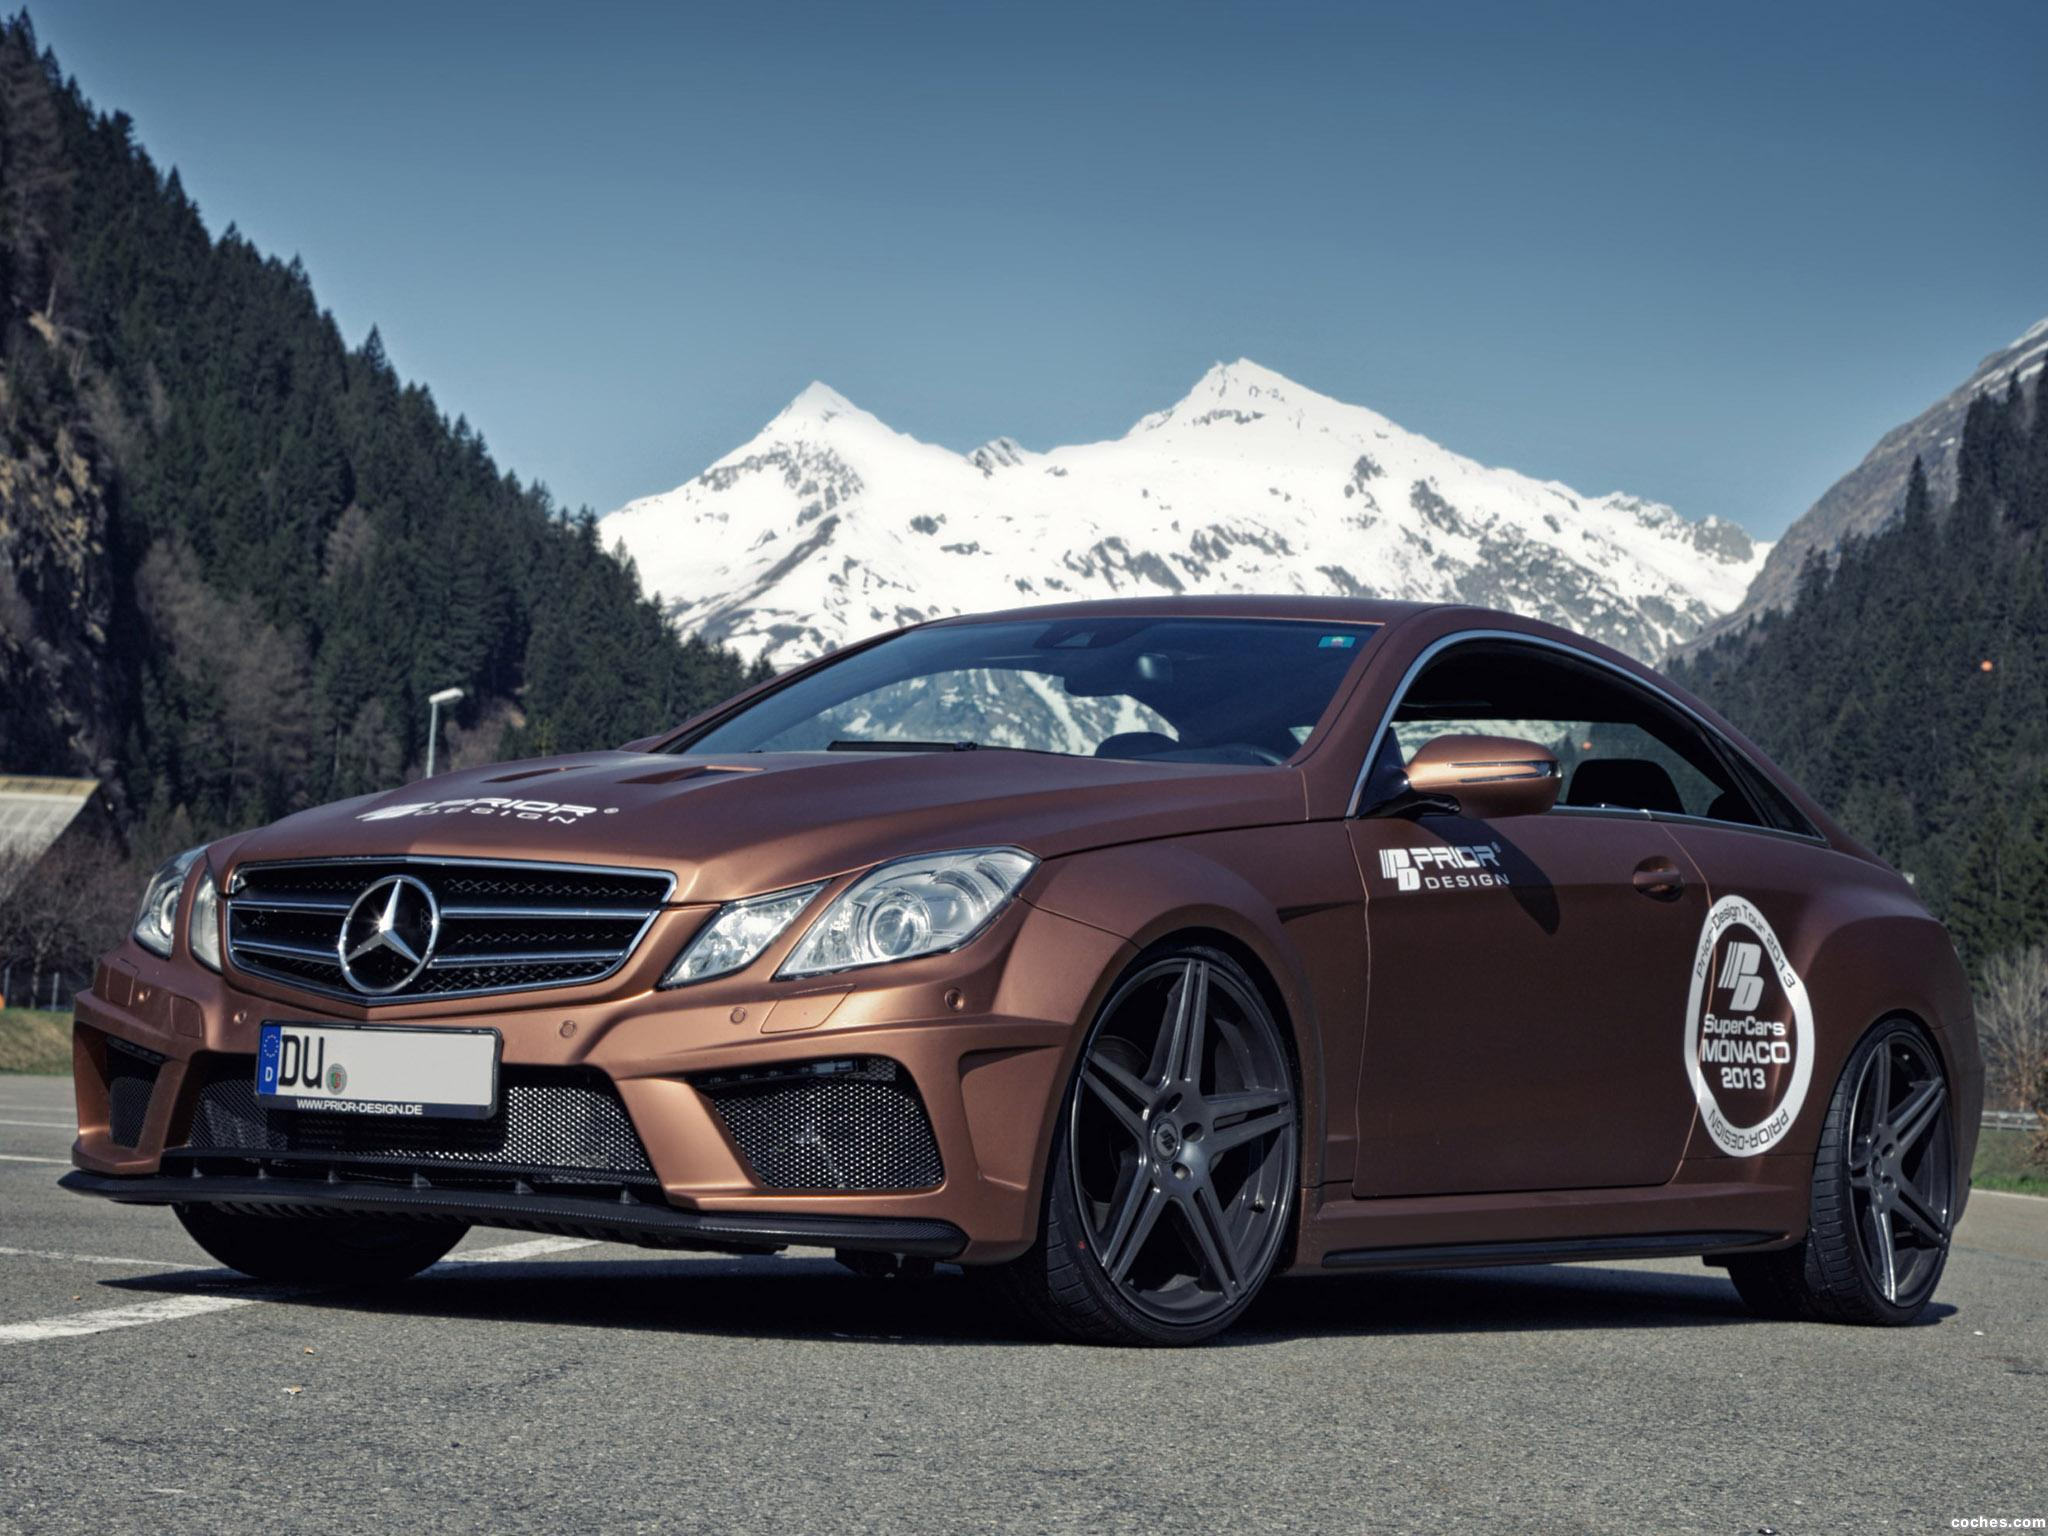 prior-design_mercedes-e-klasse-coupe-pd850-black-edition-widebody-2013_r10.jpg